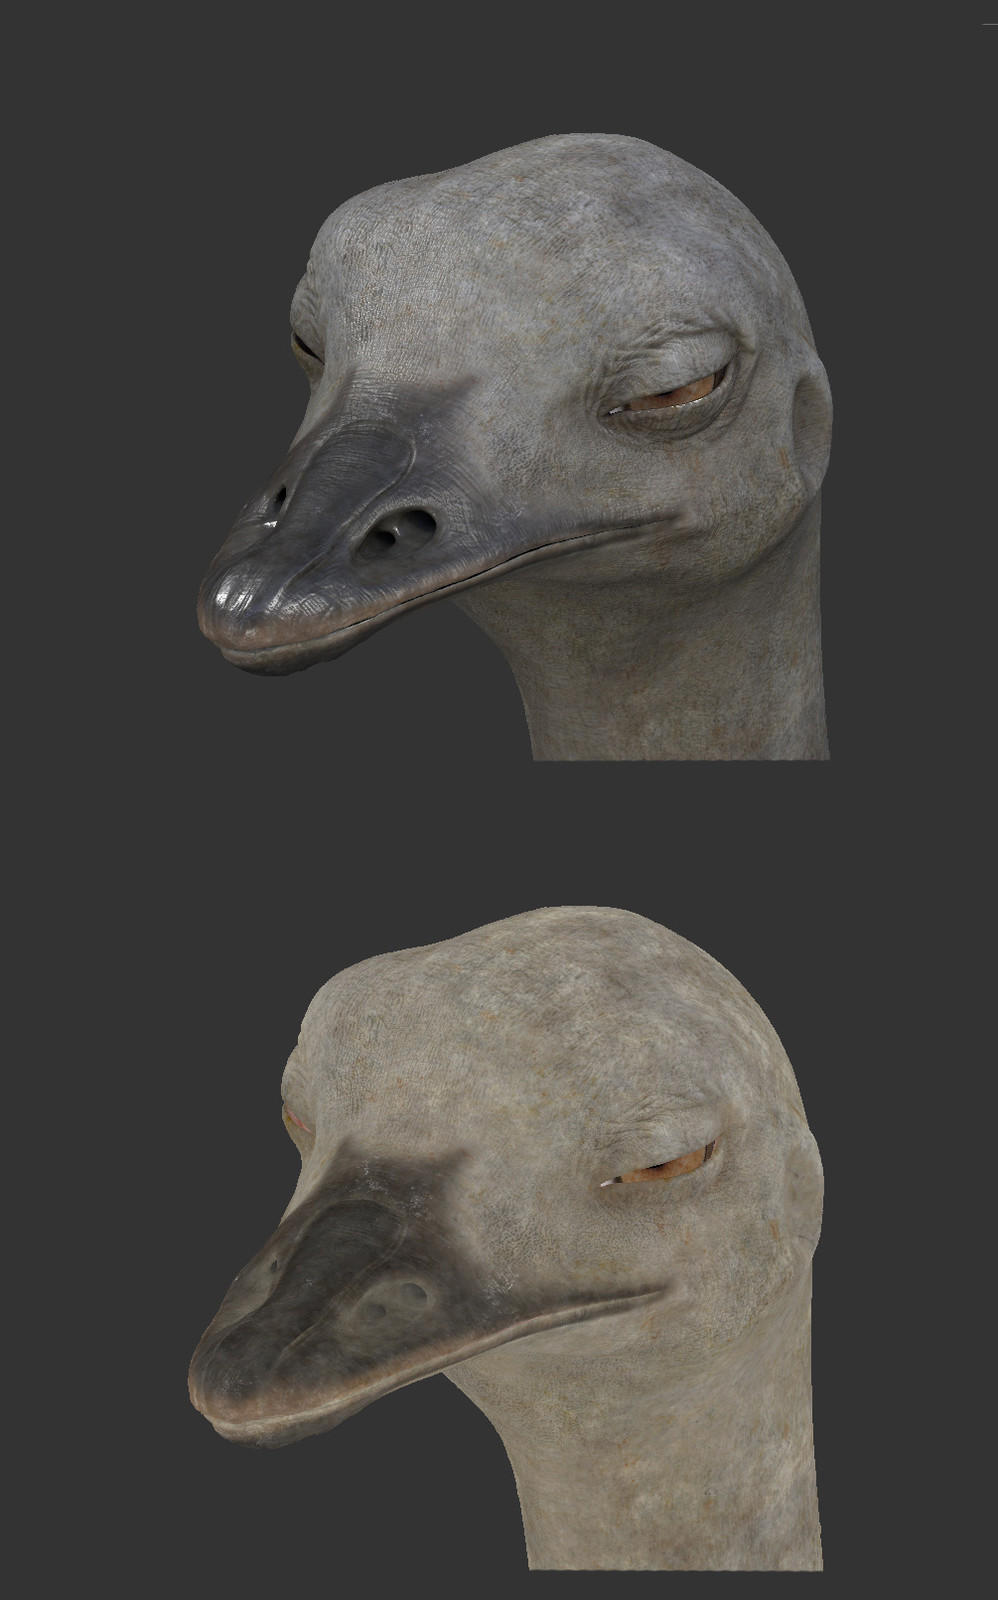 Ostrich texturing was made in Mari